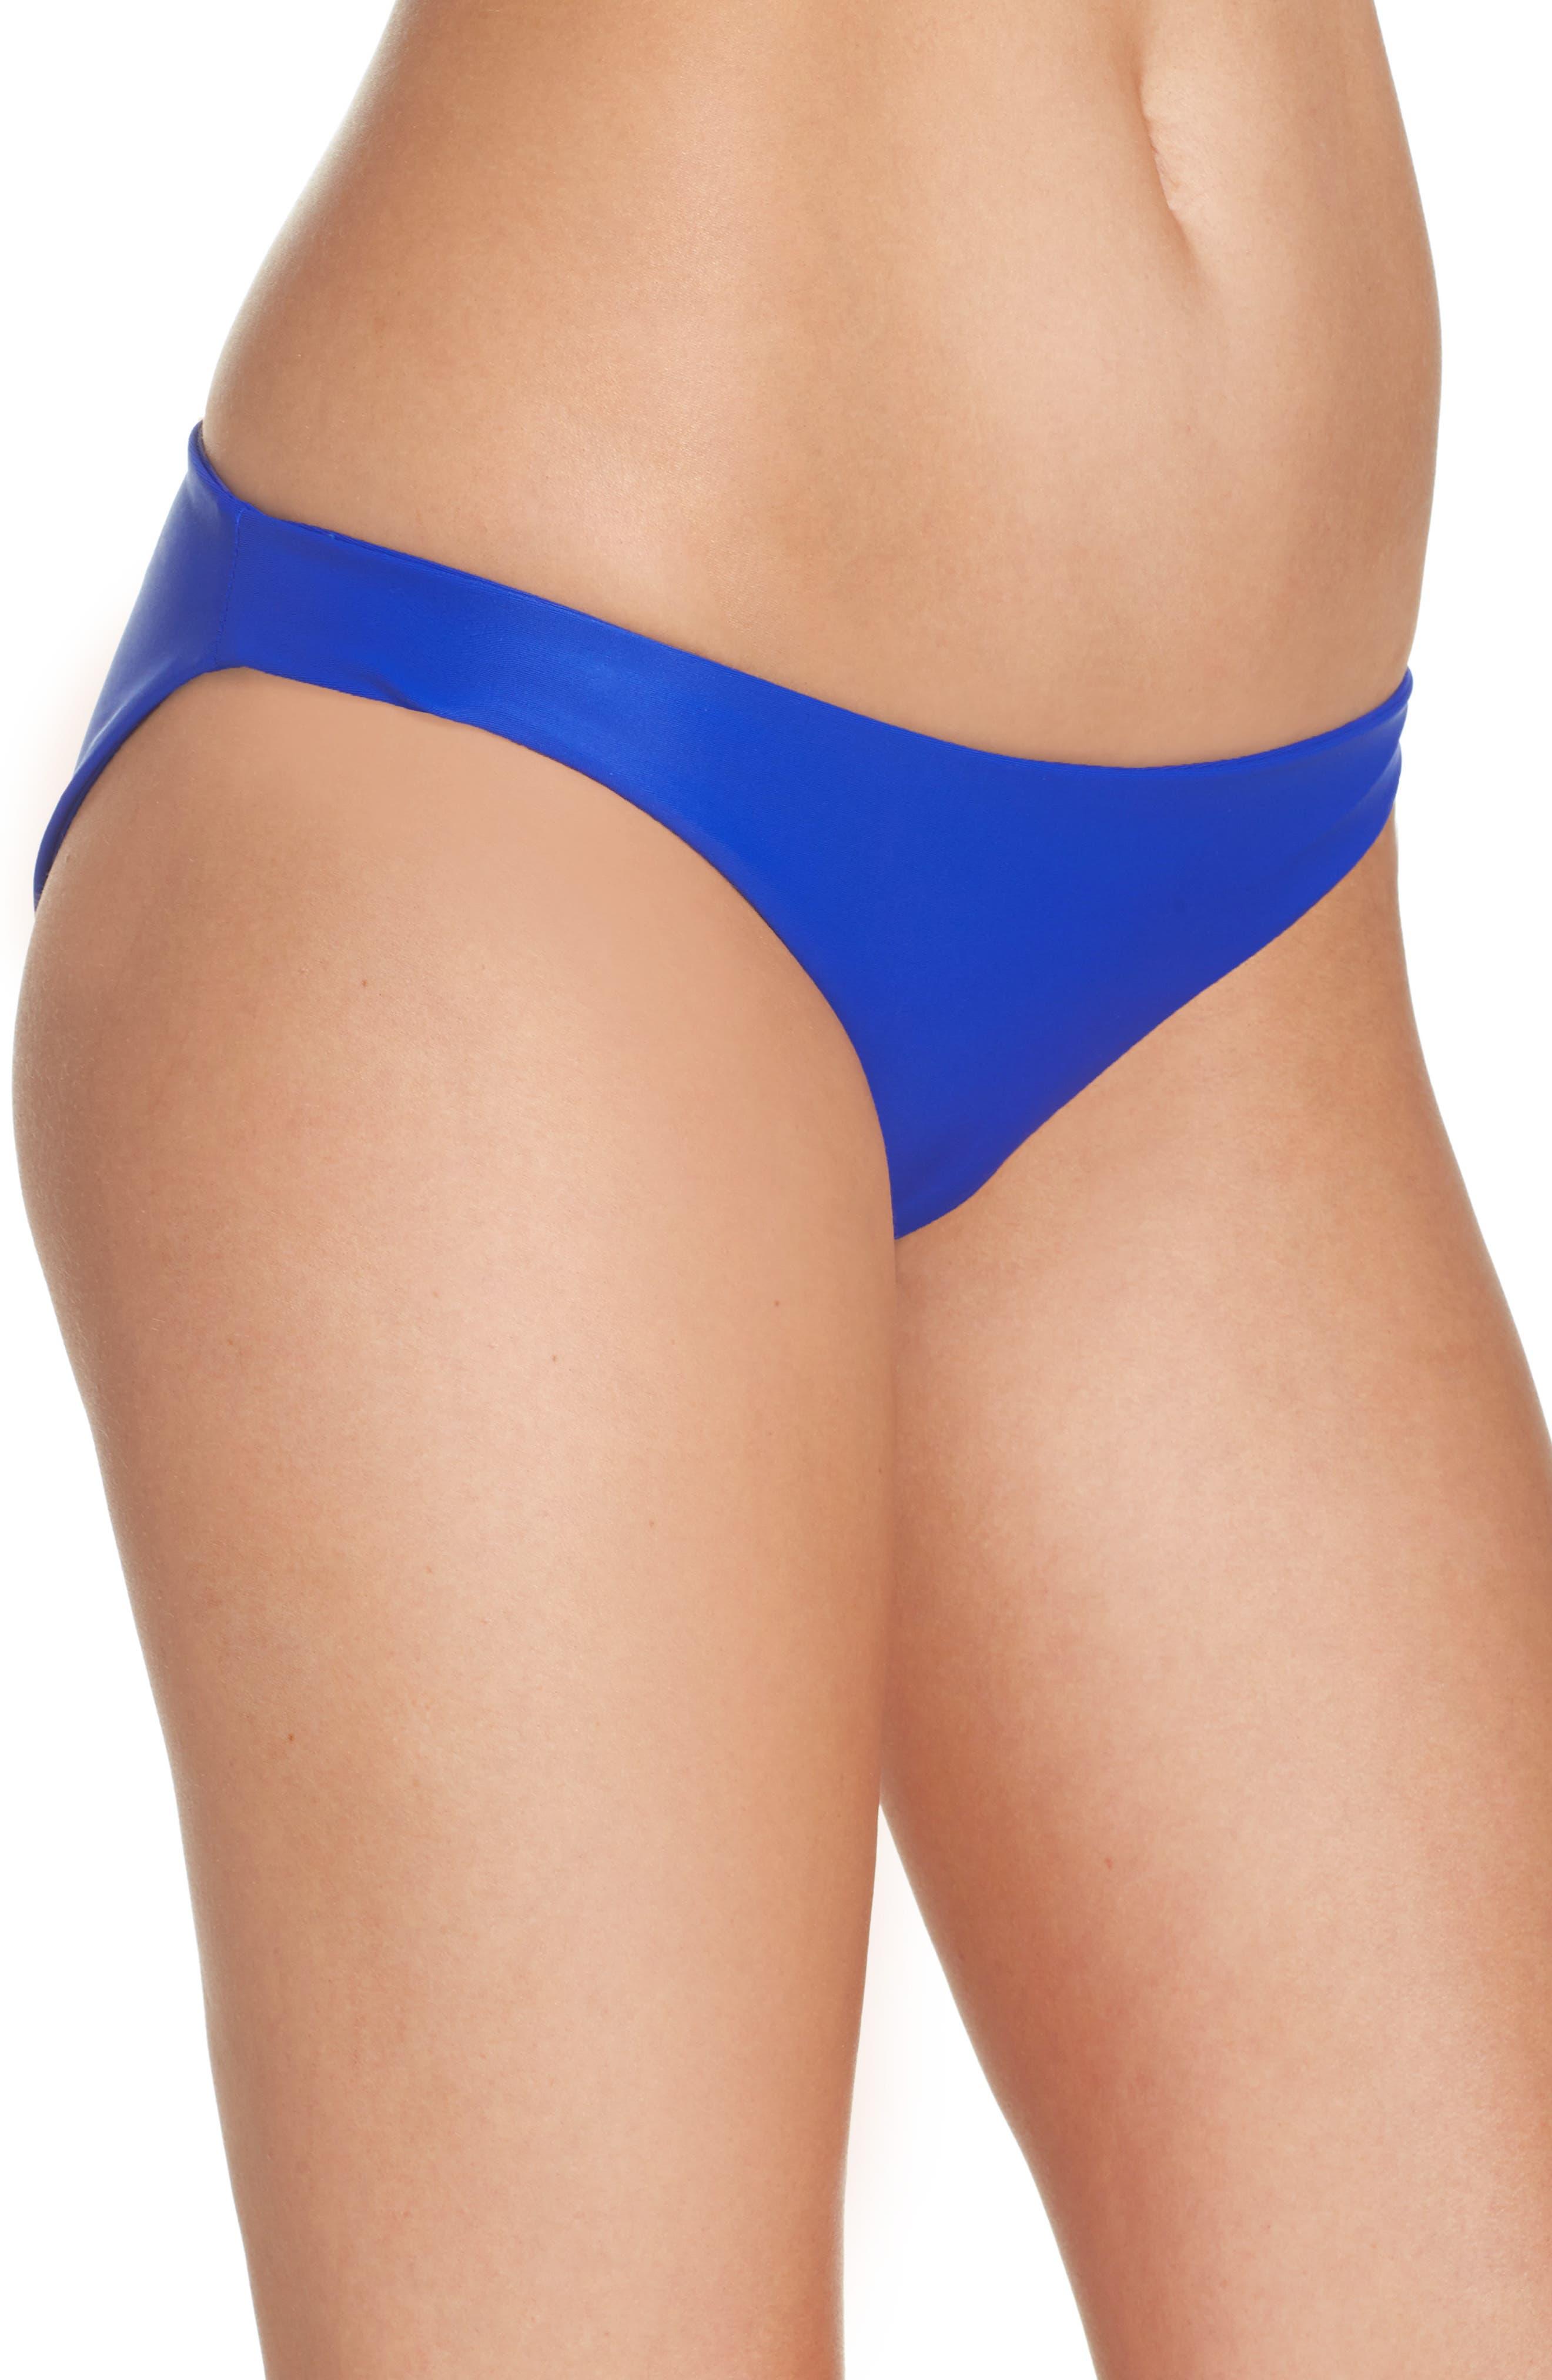 Zuma Bikini Bottoms,                             Alternate thumbnail 3, color,                             Electric Eel